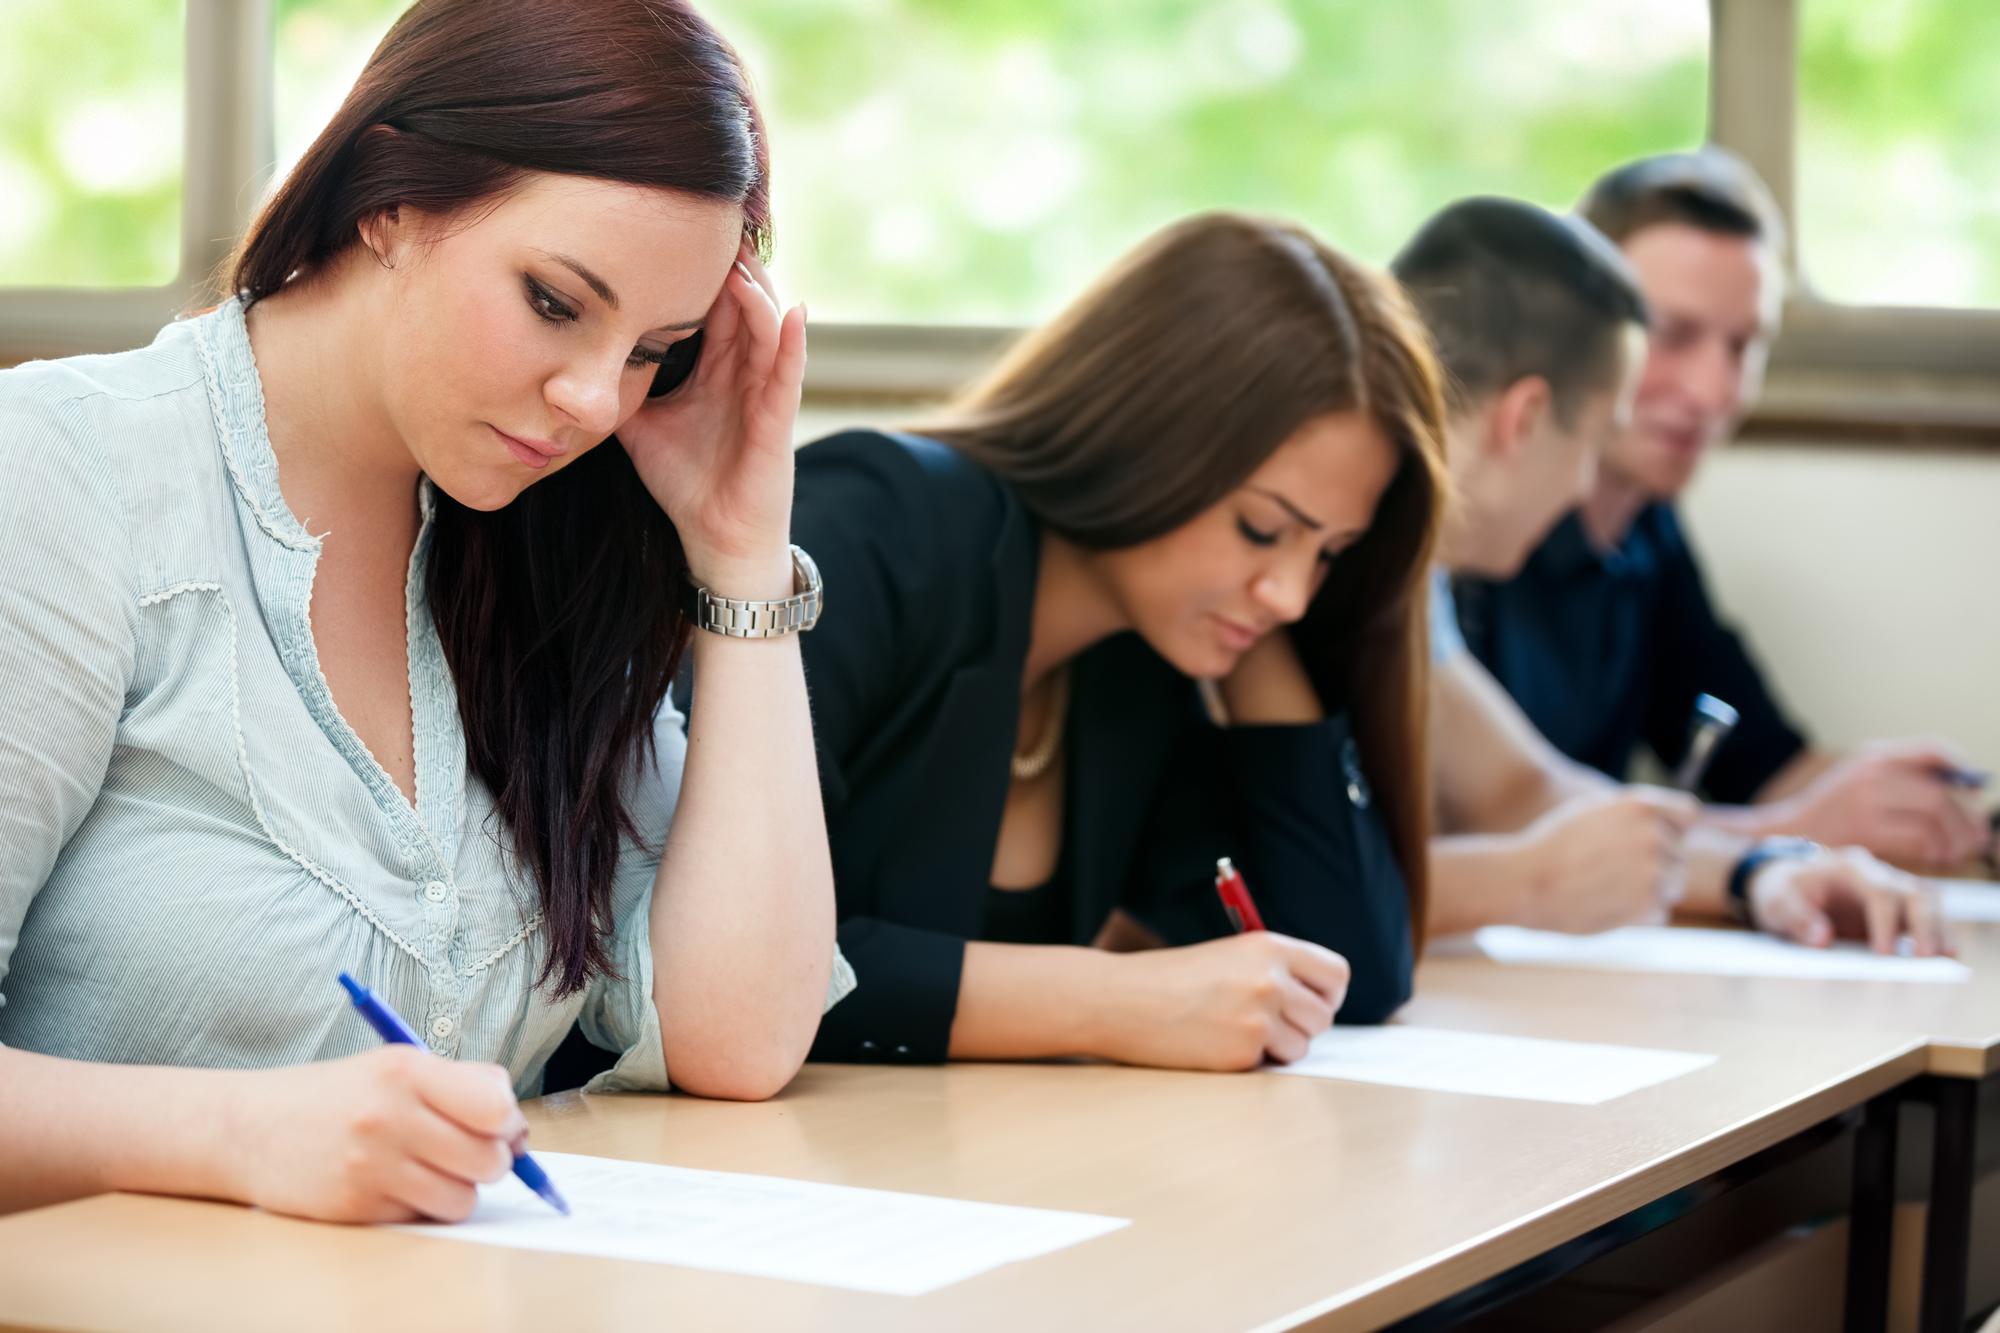 Start Preparing Now For Your Texas Teacher Certification Exams